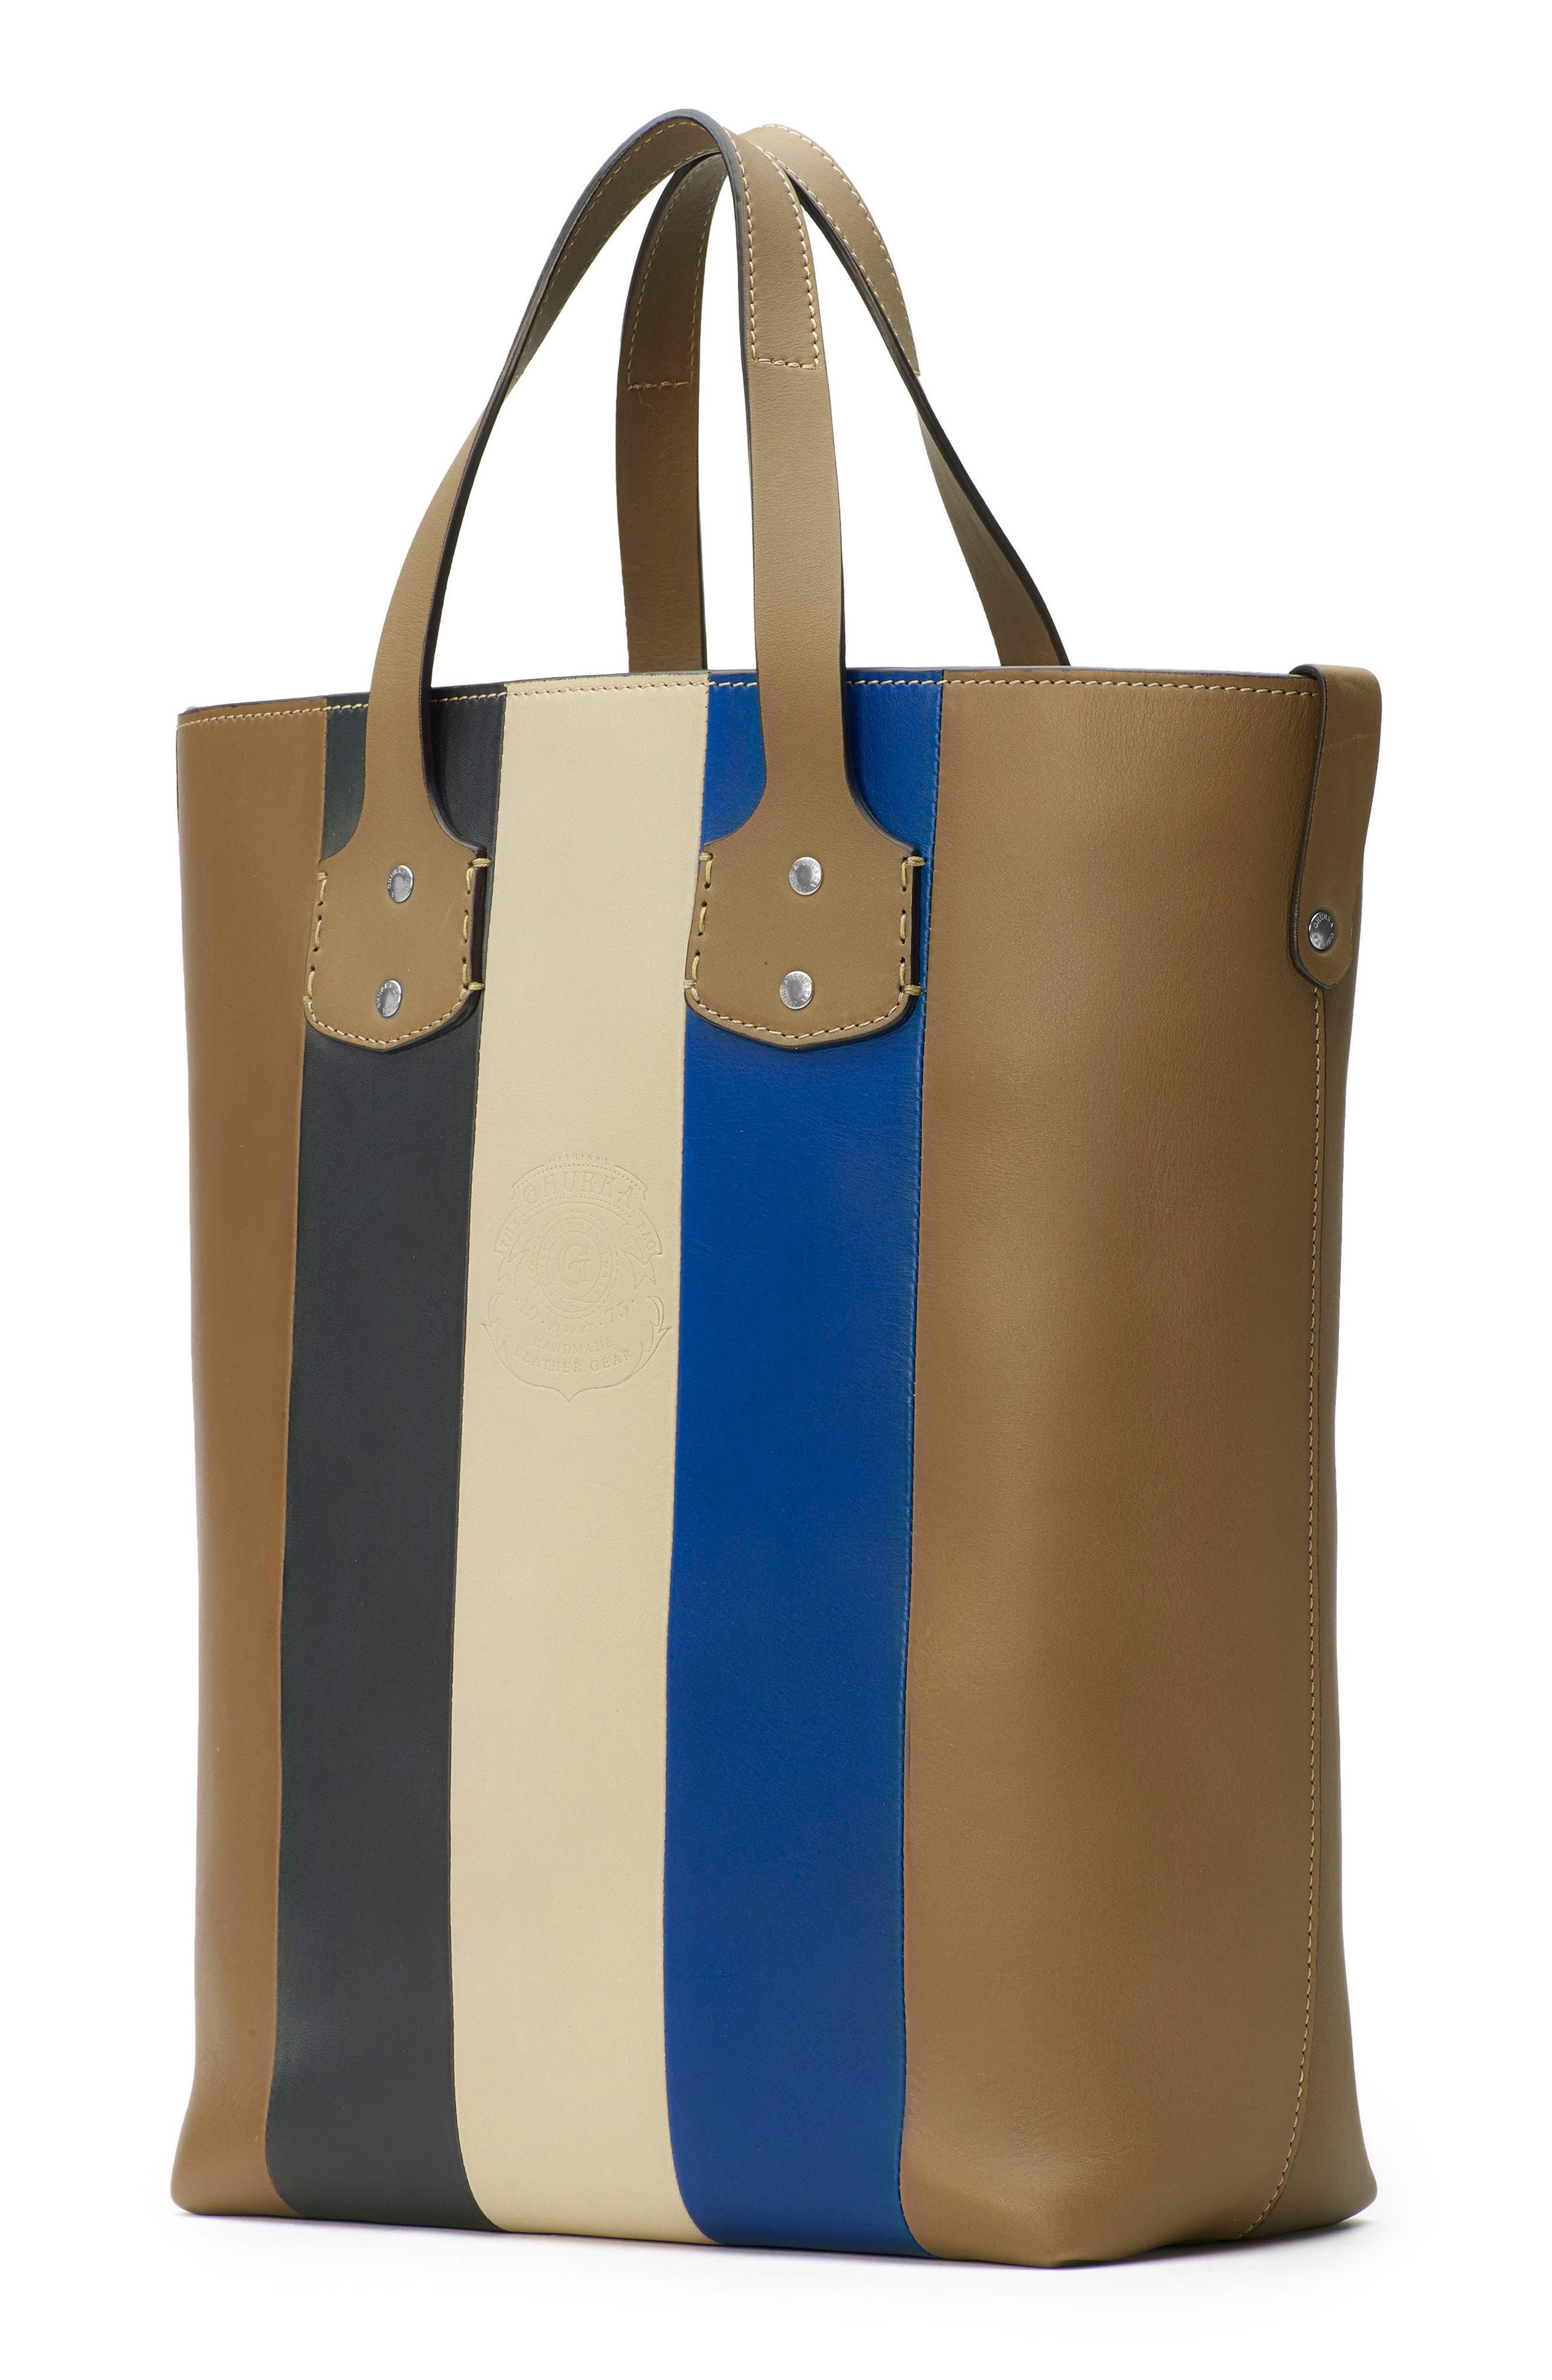 Ghurka Broadway Leather Tote Bag